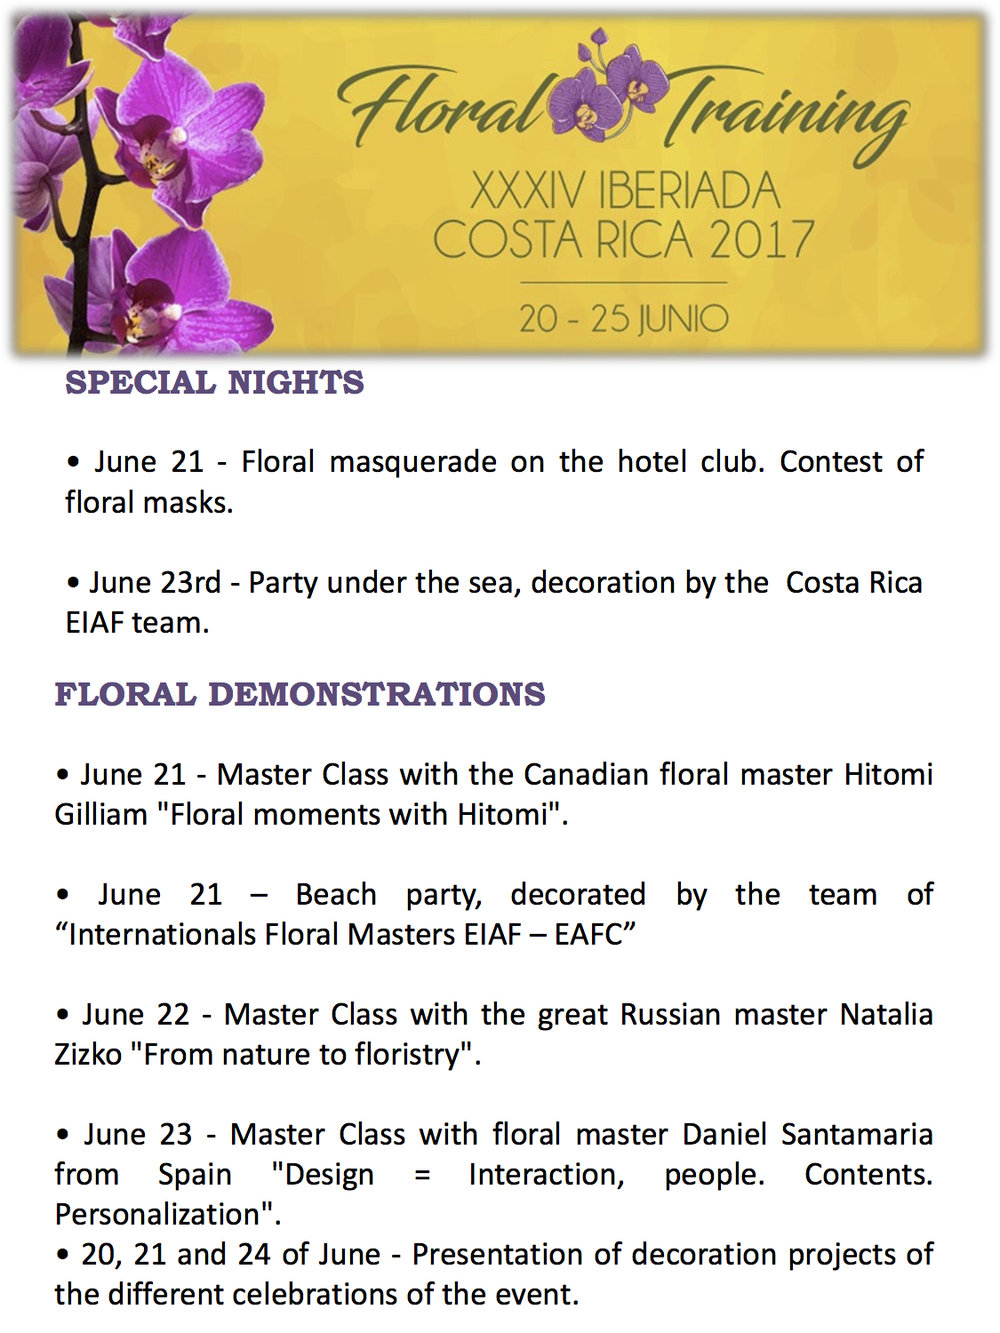 Floral Training - XXXIV Iberiada Costa Rica 2017 (English) 7.jpg